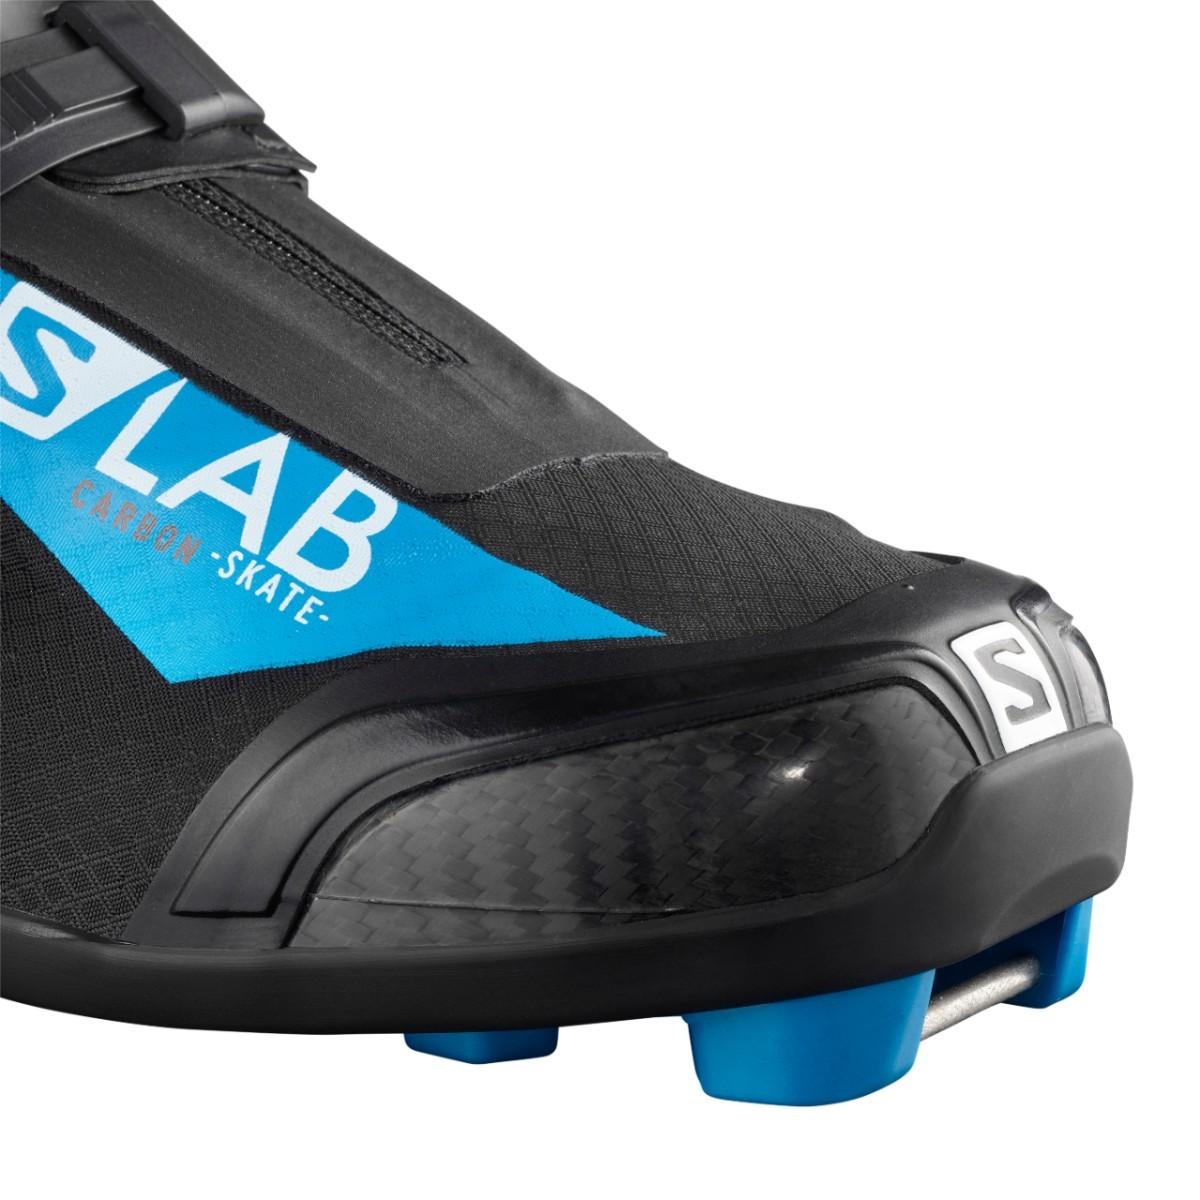 Salomon SLAB Carbon Skate Prolink Top Narty